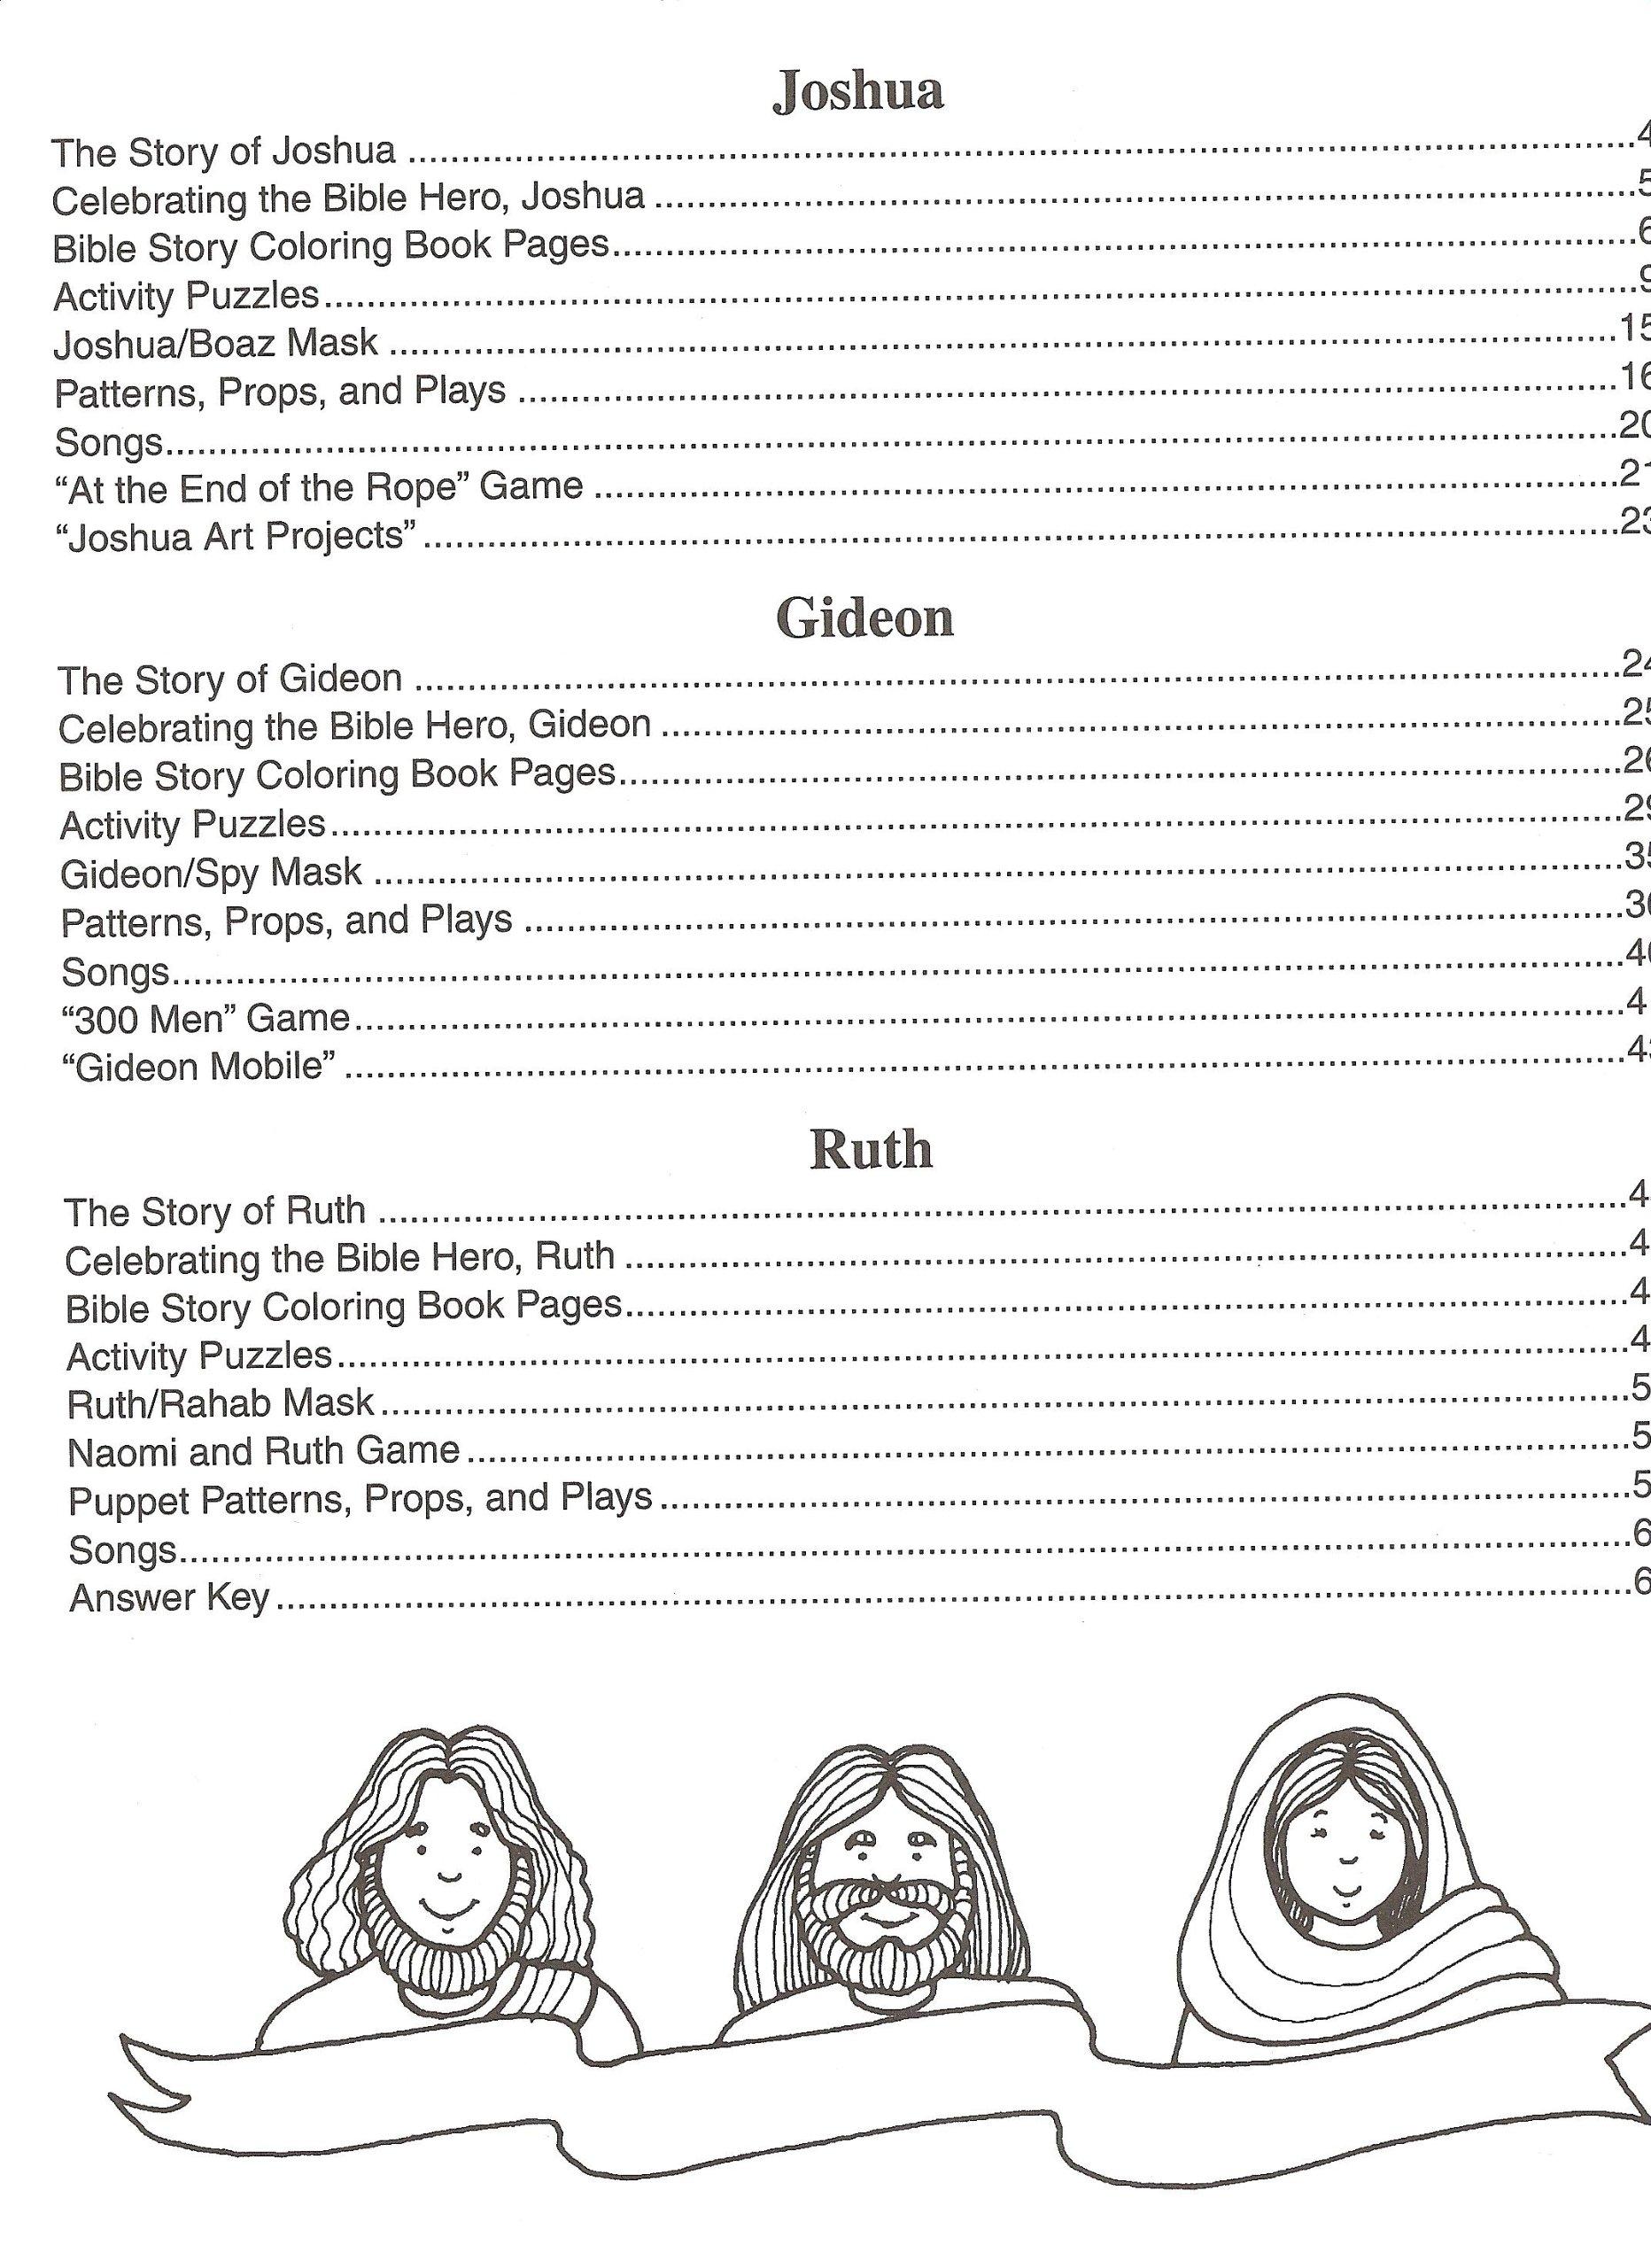 bible heroes joshua gideon and ruth bible heroes series